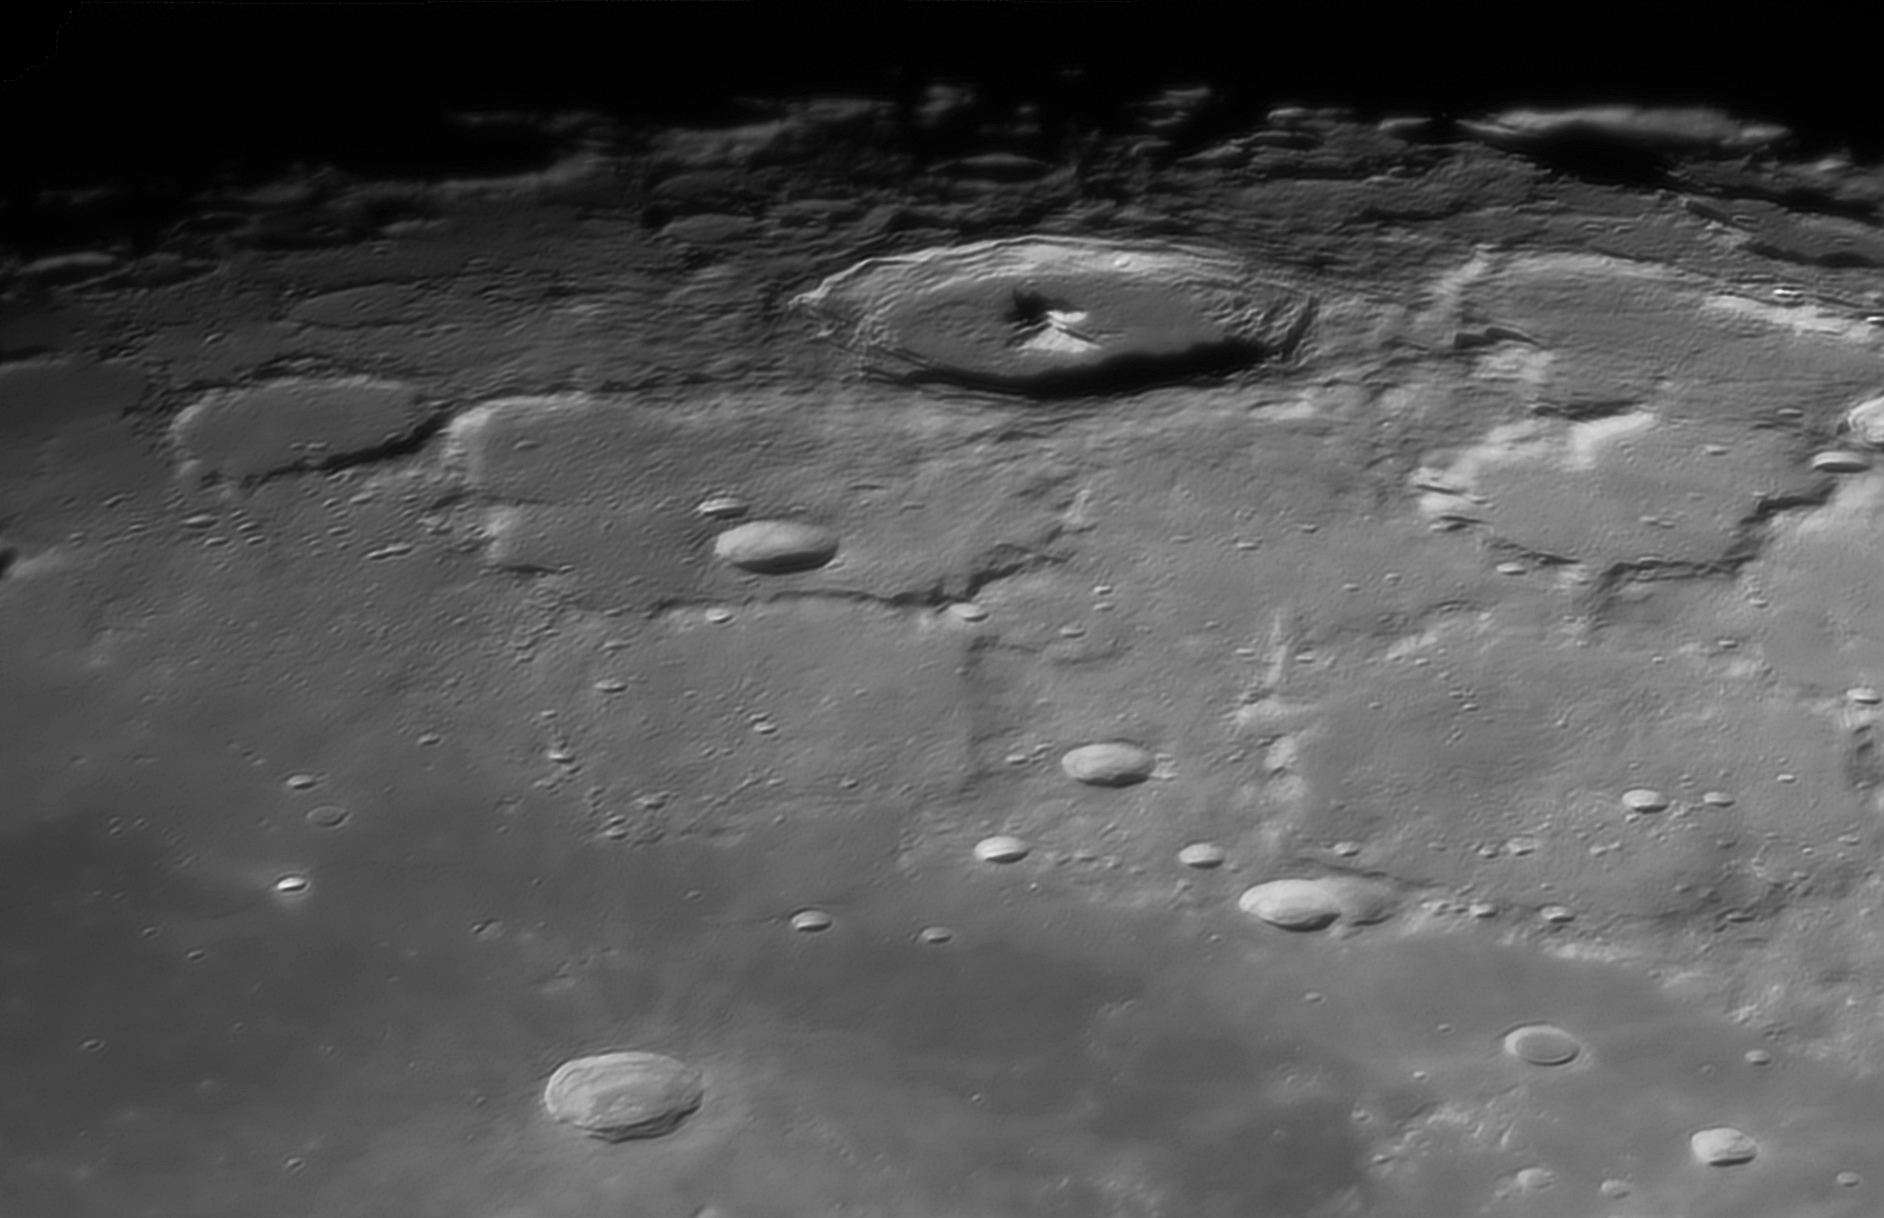 lune_10nov2019_21h05tu.jpg.6efdd45810e053b6b5cbf975ec8376a4.jpg